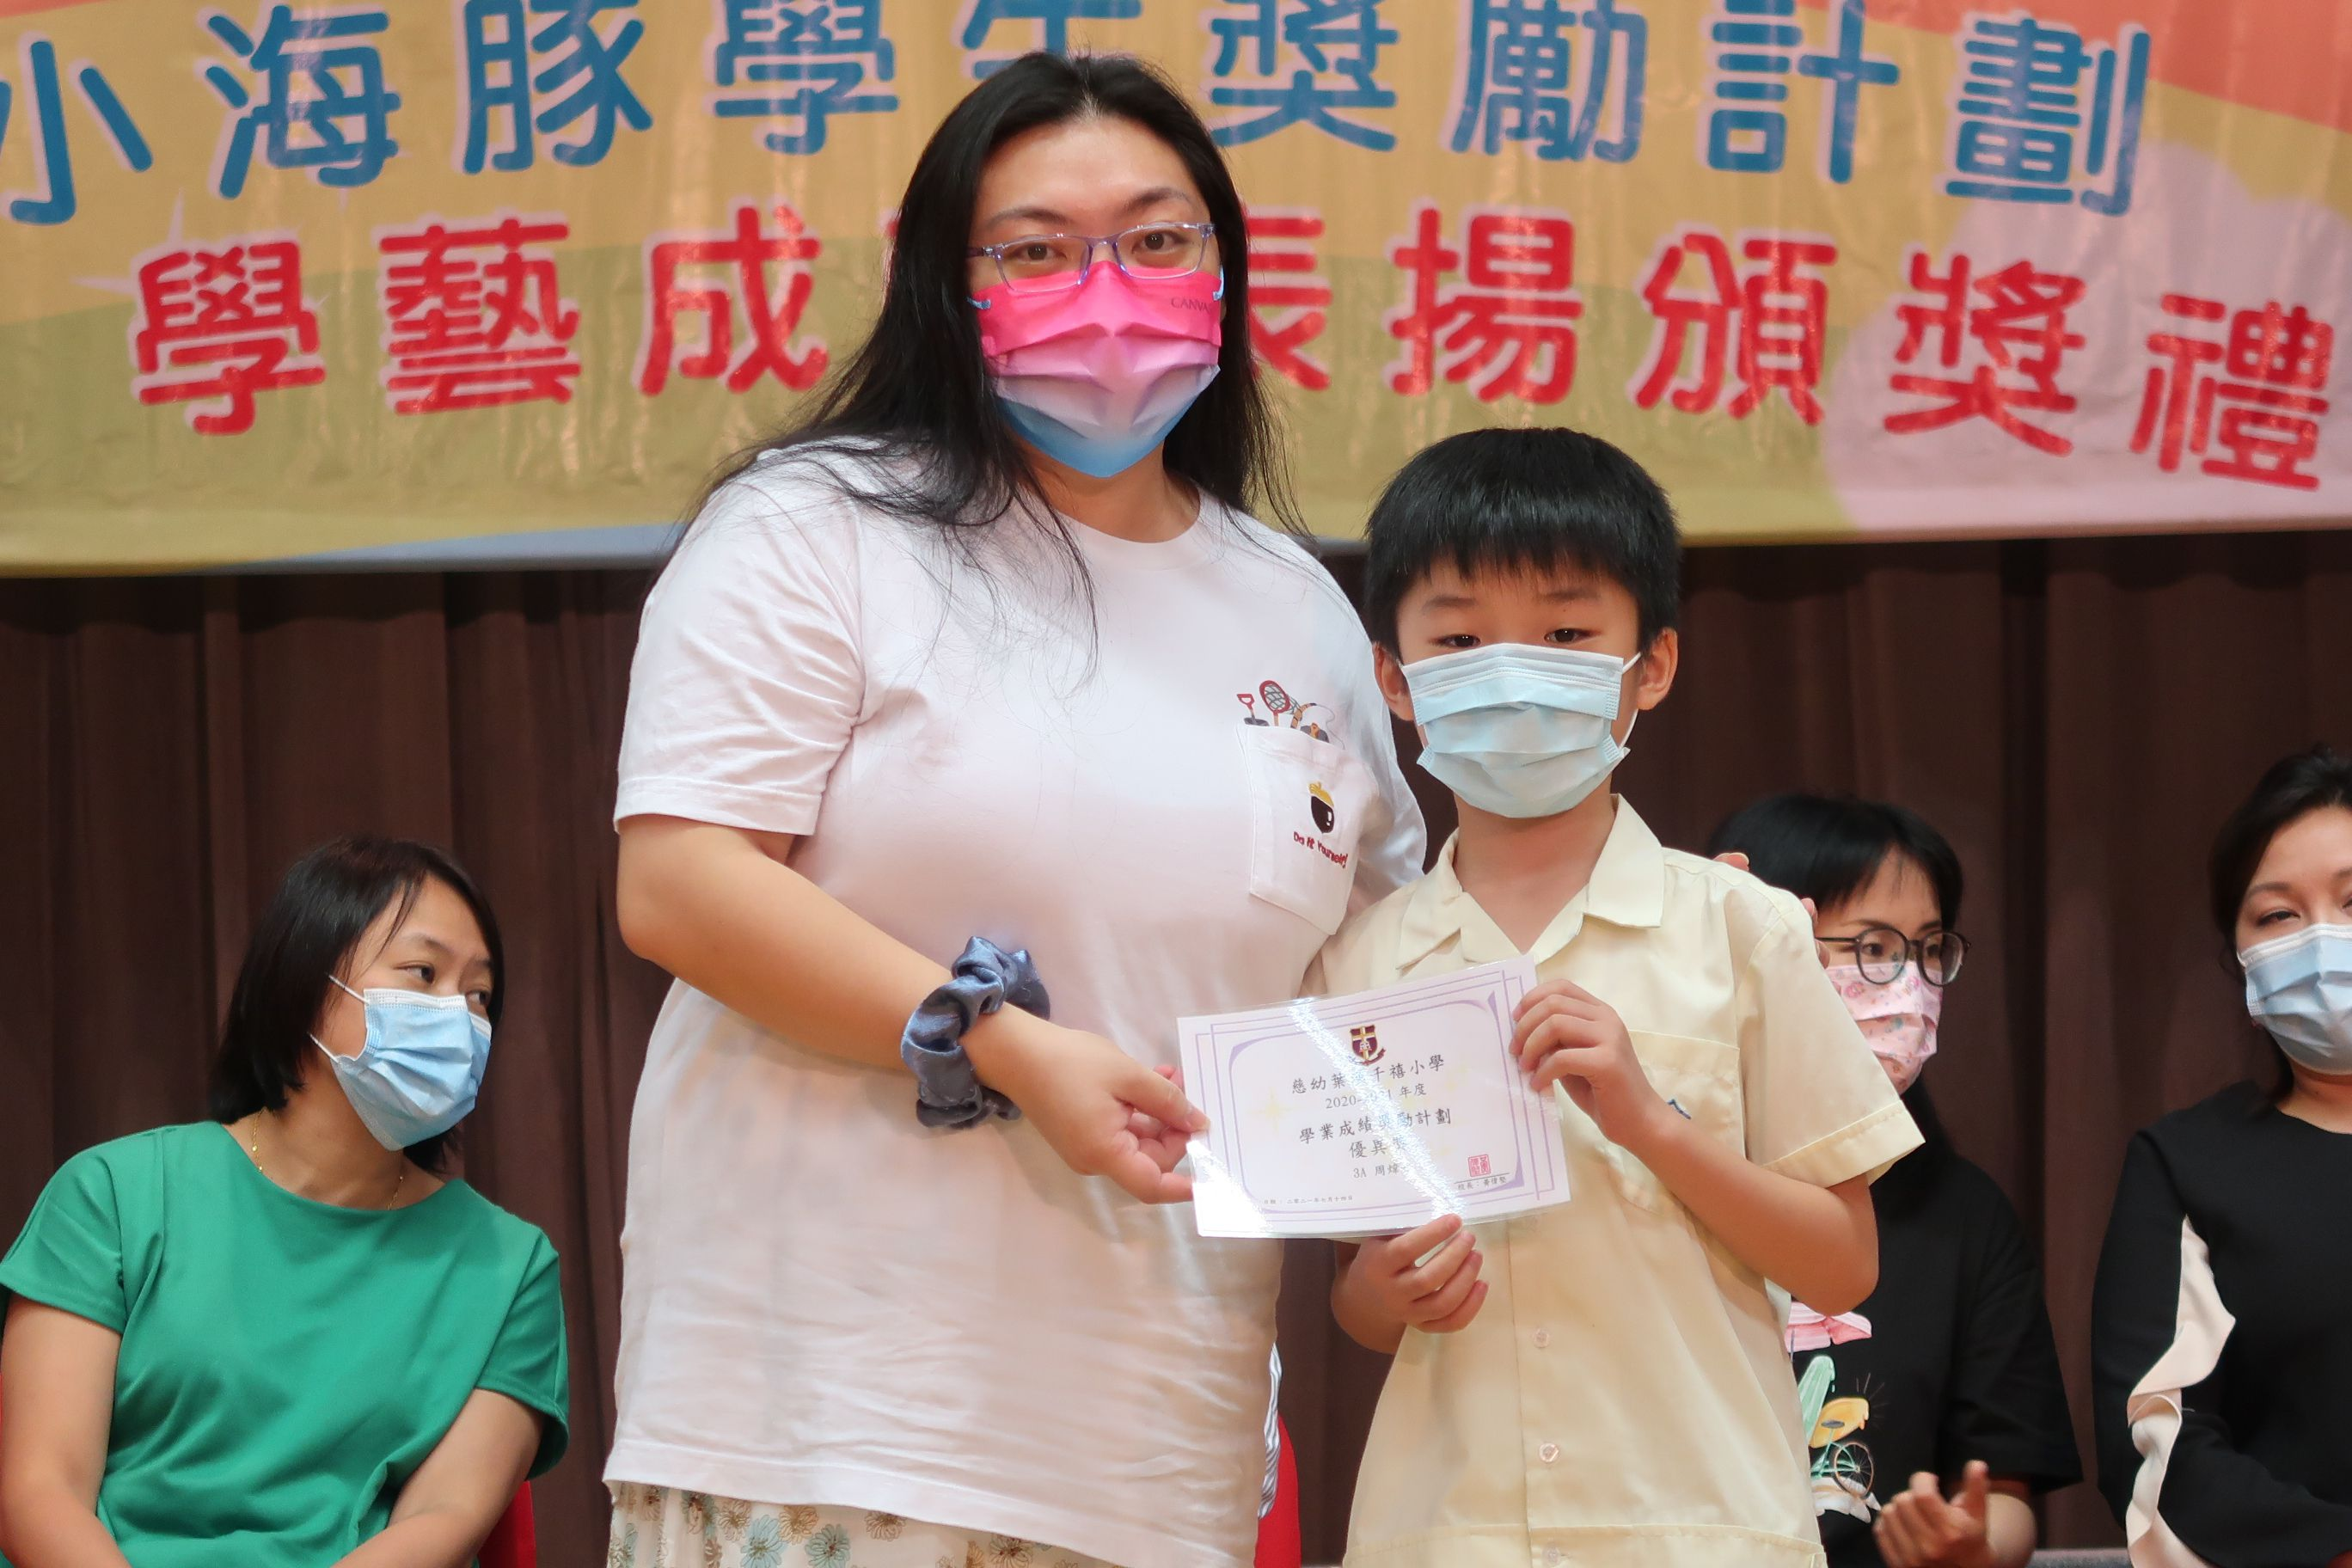 https://syh.edu.hk/sites/default/files/img_5566.jpg